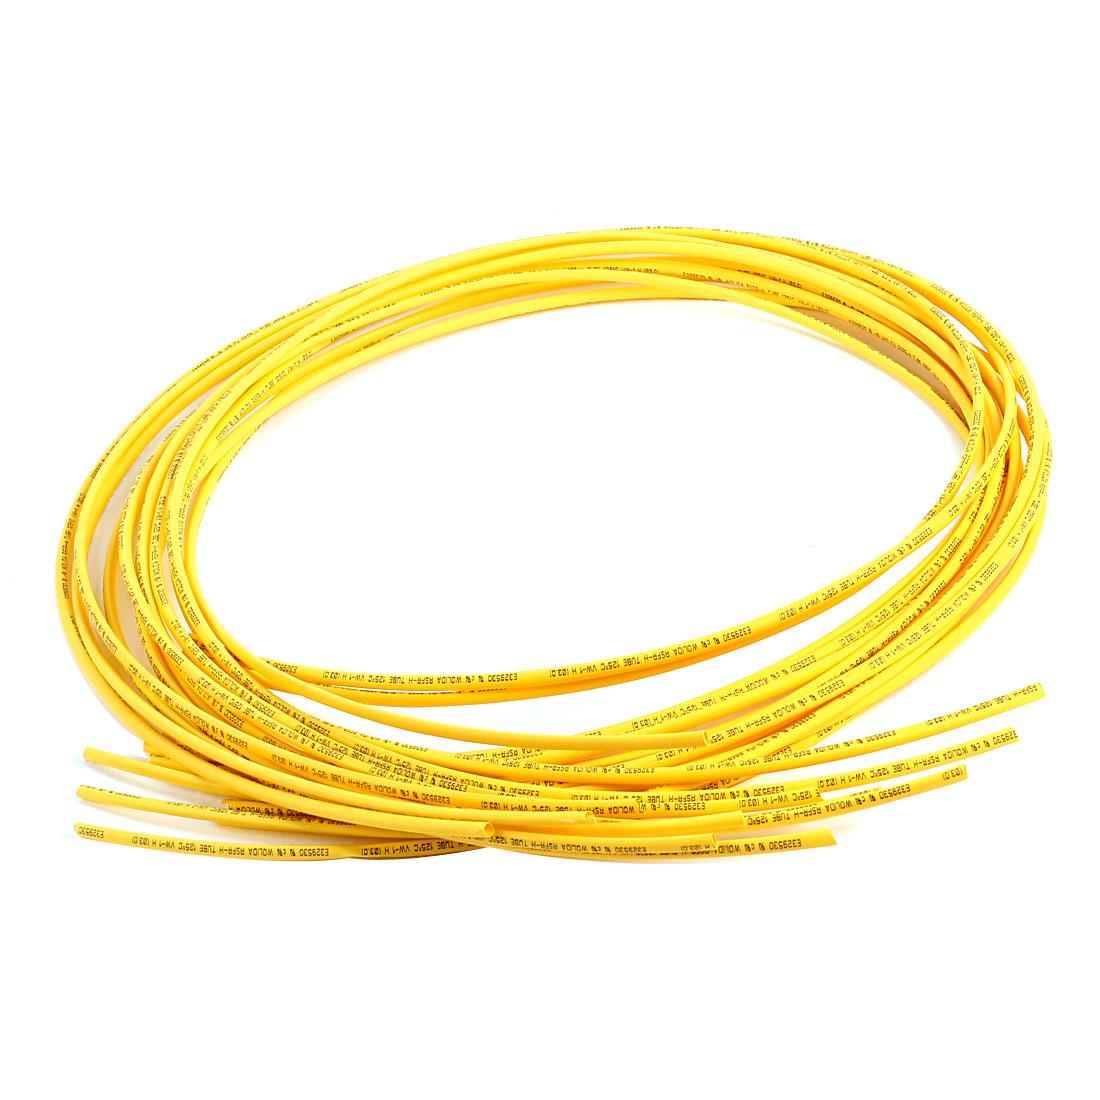 Ratio 2:1 Yellow Polyolefin 3mm Dia Heat Shrink Shrinkable Tube 3.3Ft 12 Pcs